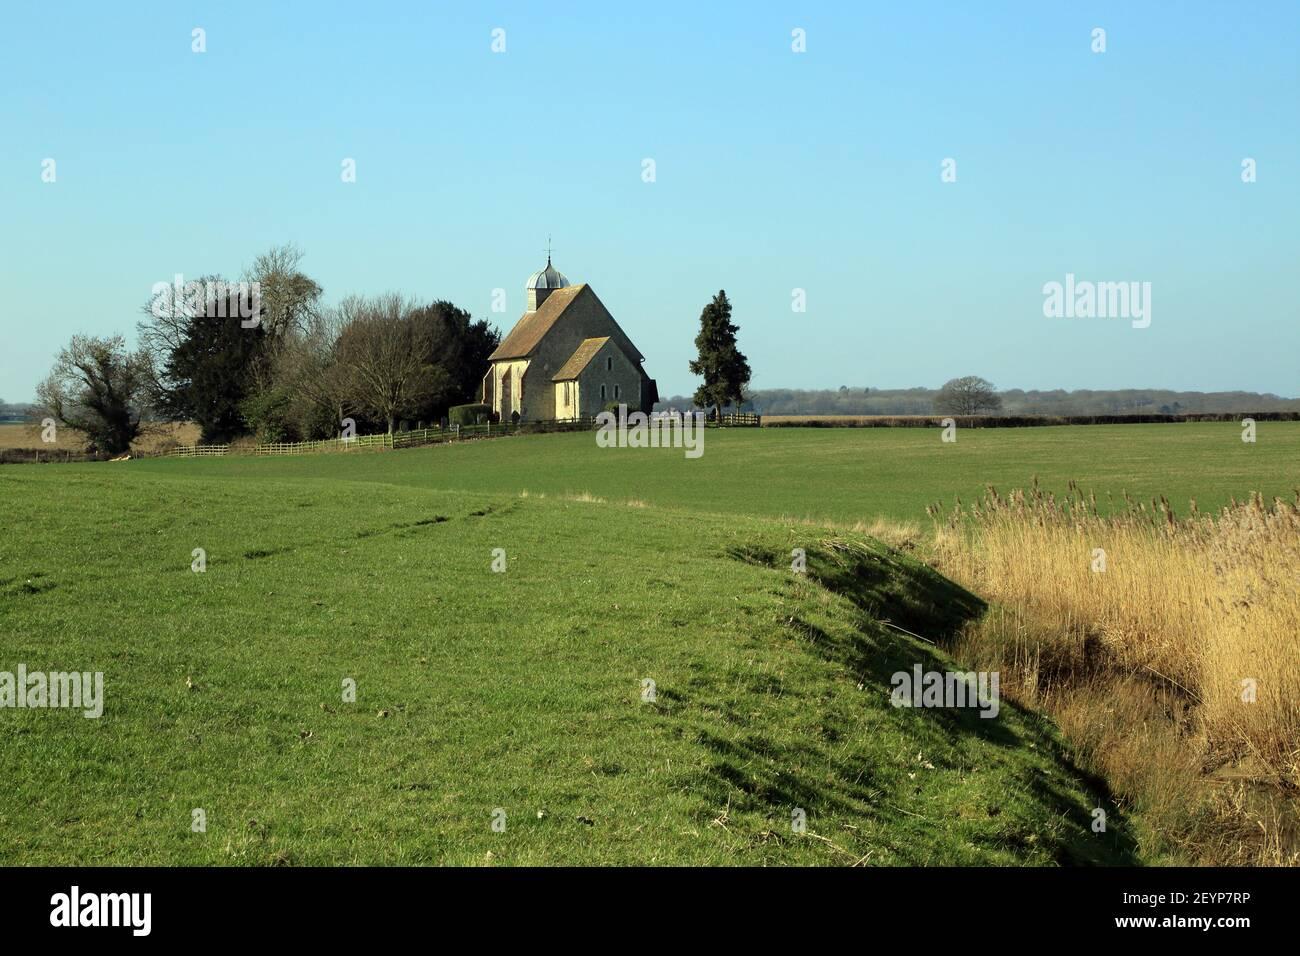 Vista de la iglesia de Saint Rumwold desde las orillas del Canal Militar Real, Bonnington cerca de Ashford en Kent, Inglaterra, Reino Unido Foto de stock